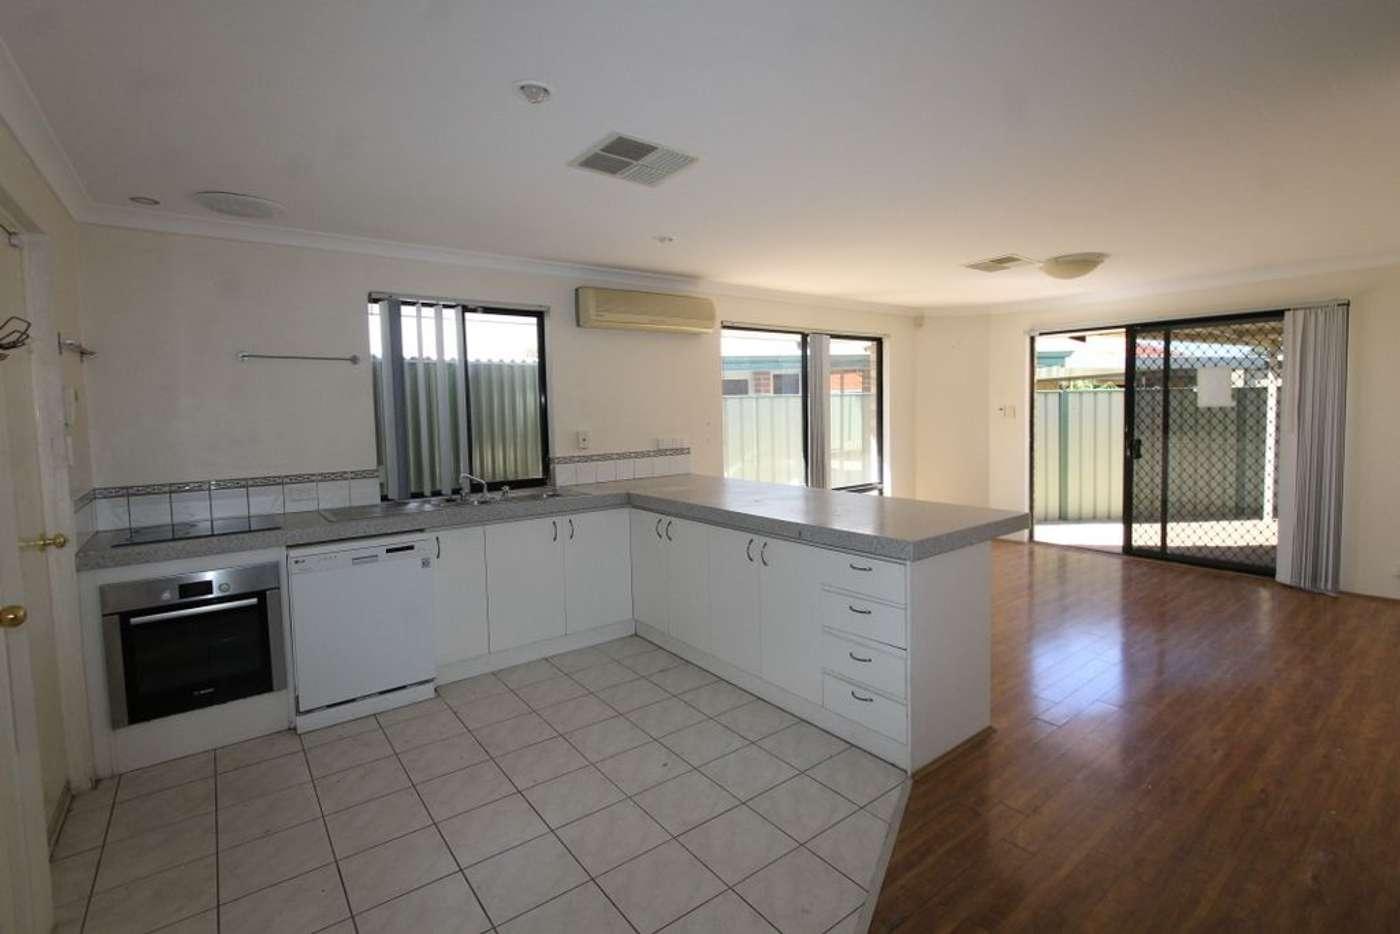 Sixth view of Homely house listing, 6 Tekapo Lane, Ballajura WA 6066